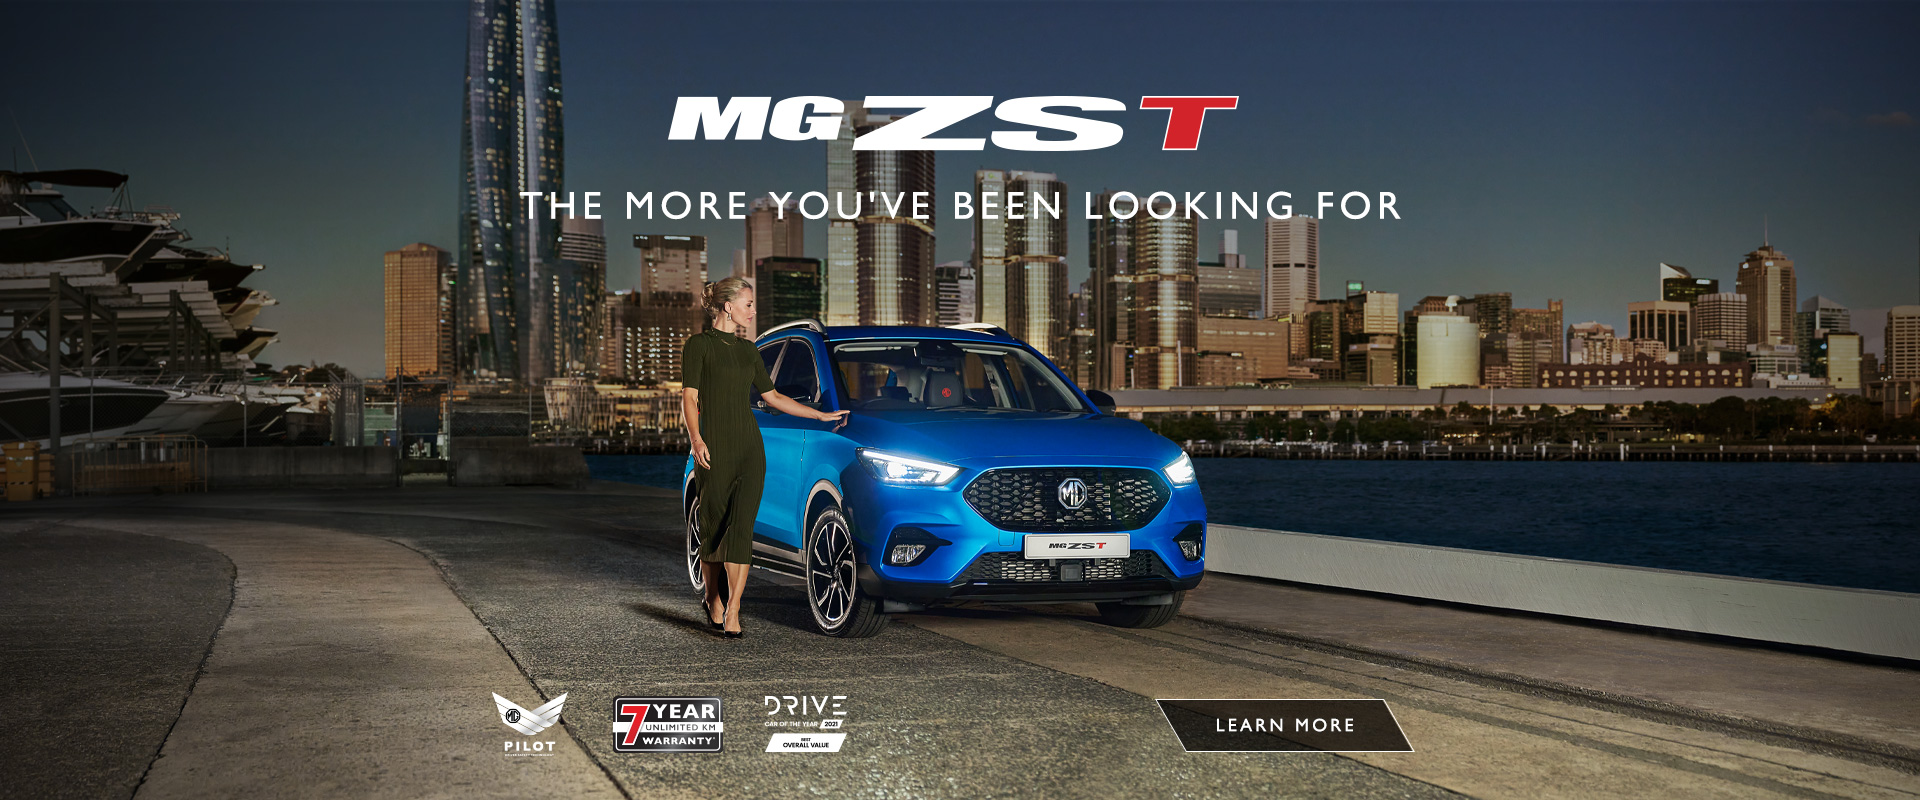 MG-ZST-HPB-Jul21-YP